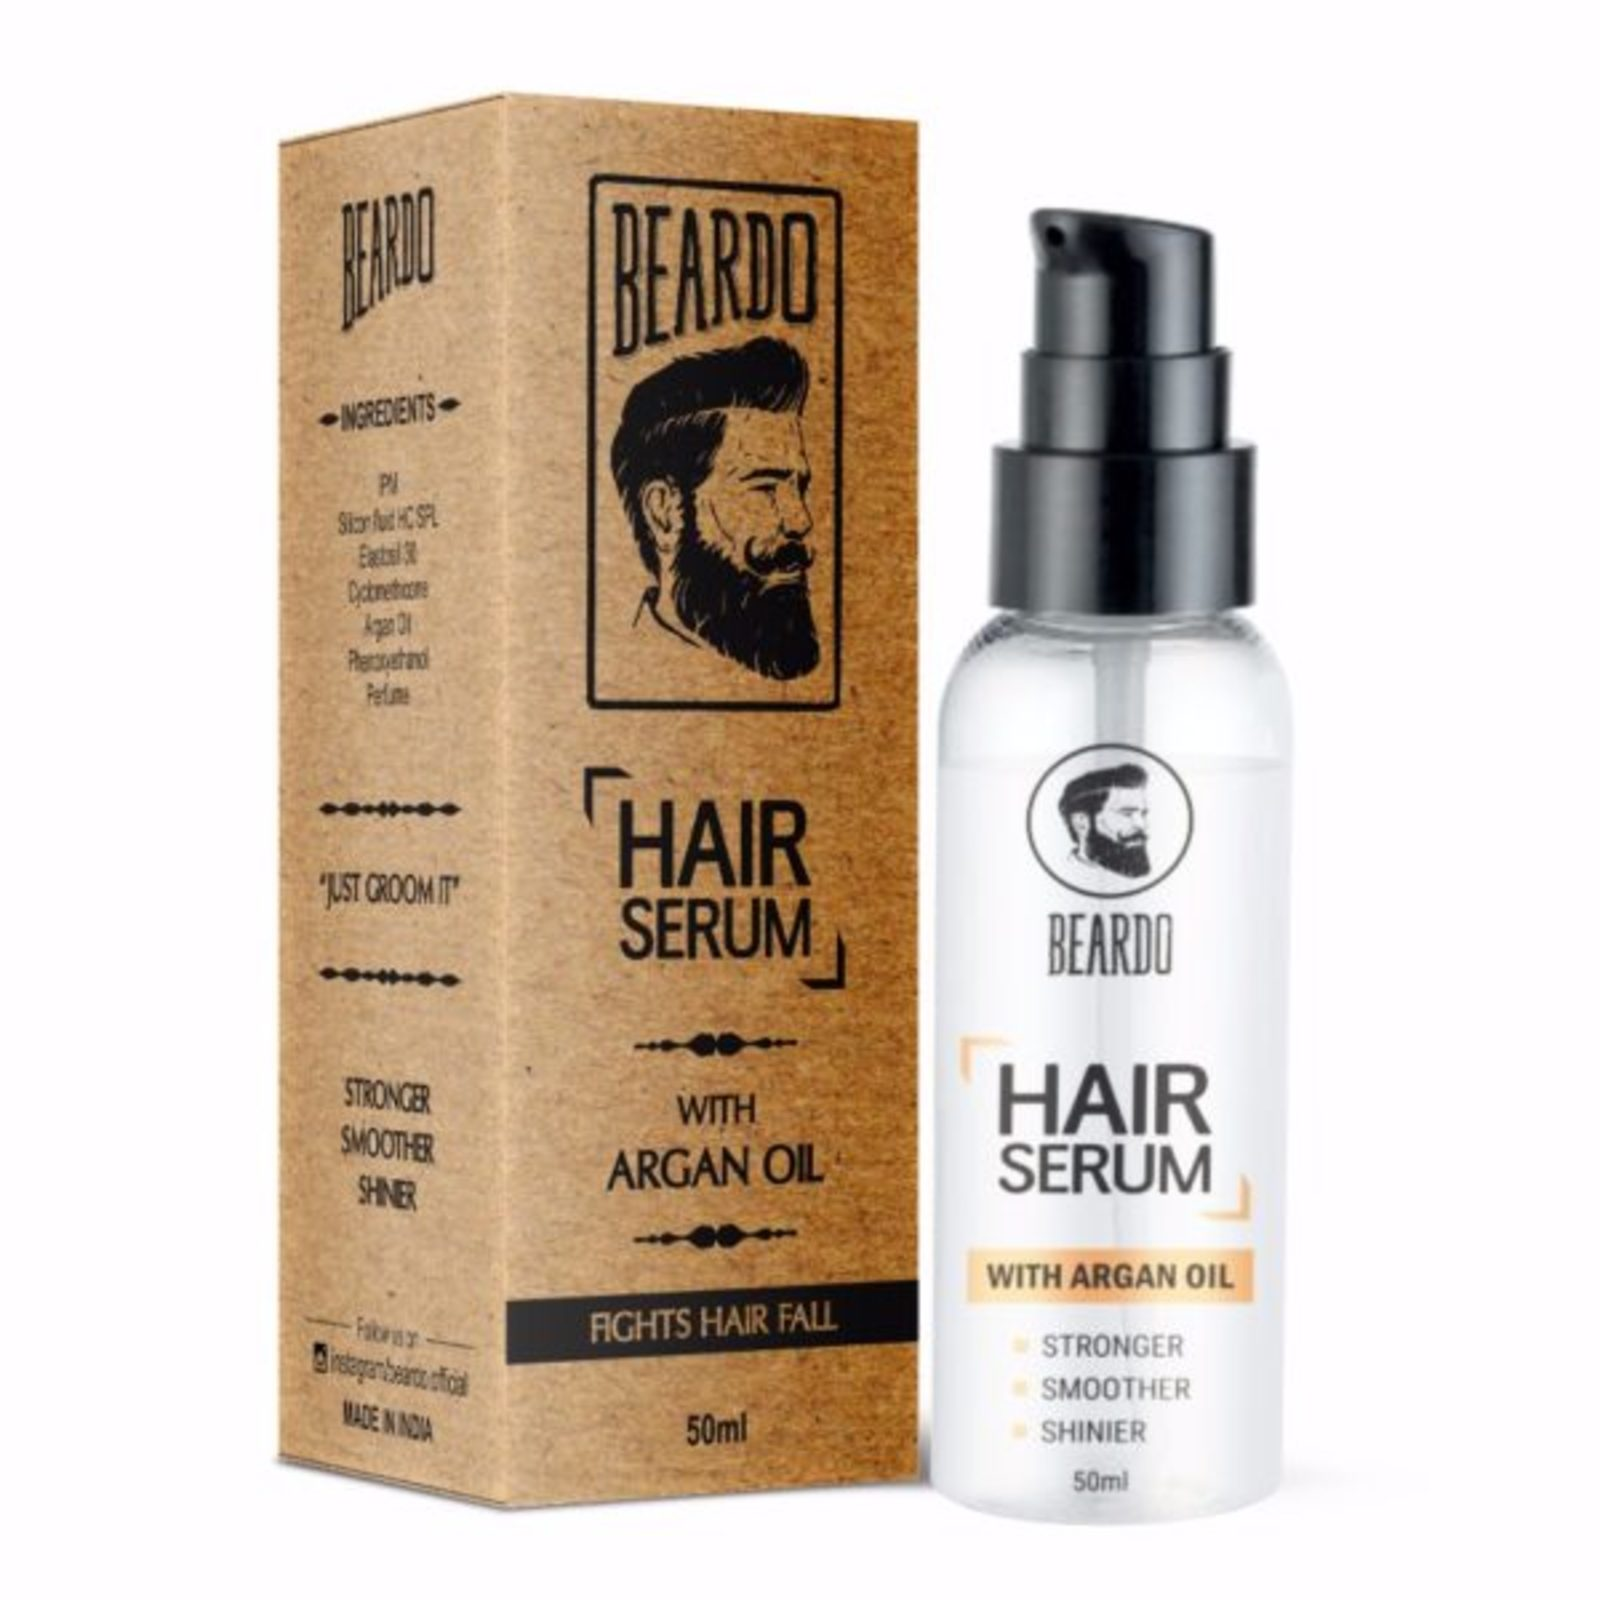 Beardo Hair Serum (50ml)